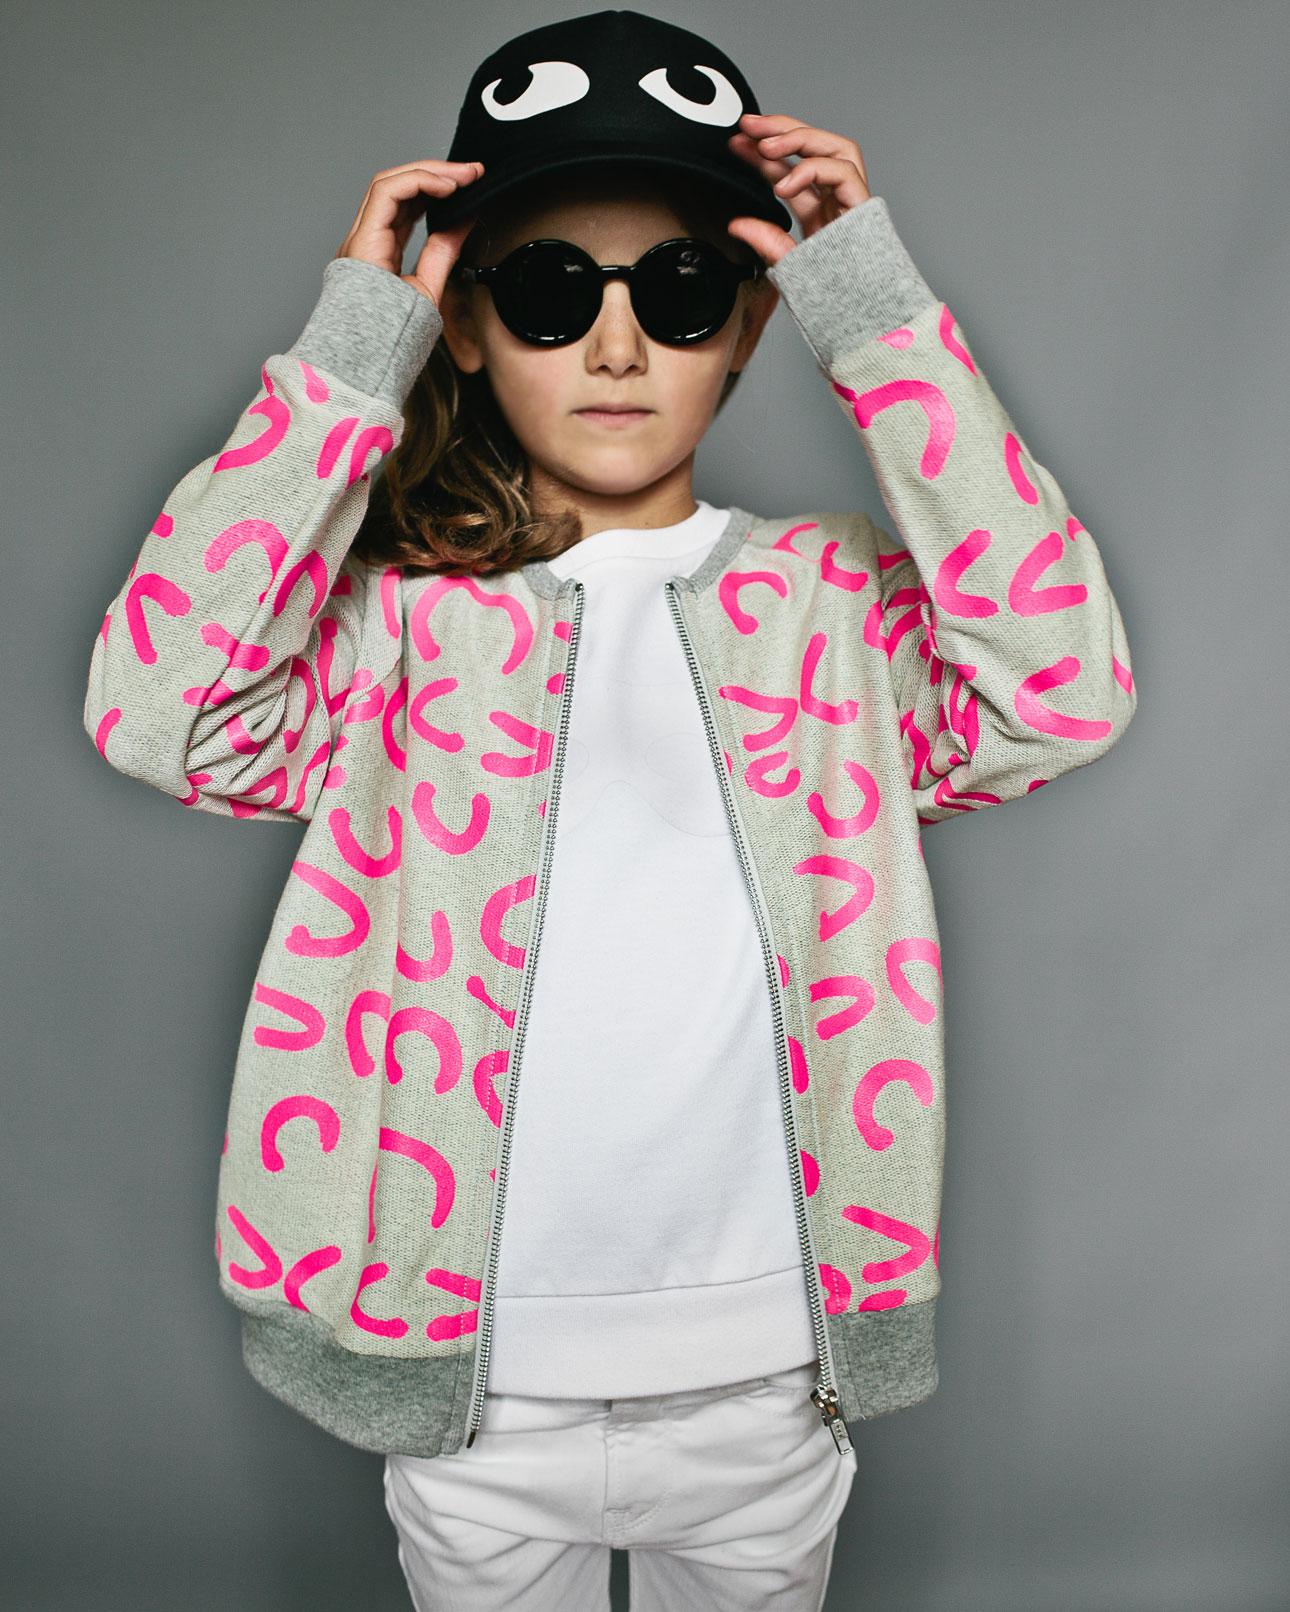 Beau Loves ss16 holiday neon pink circles